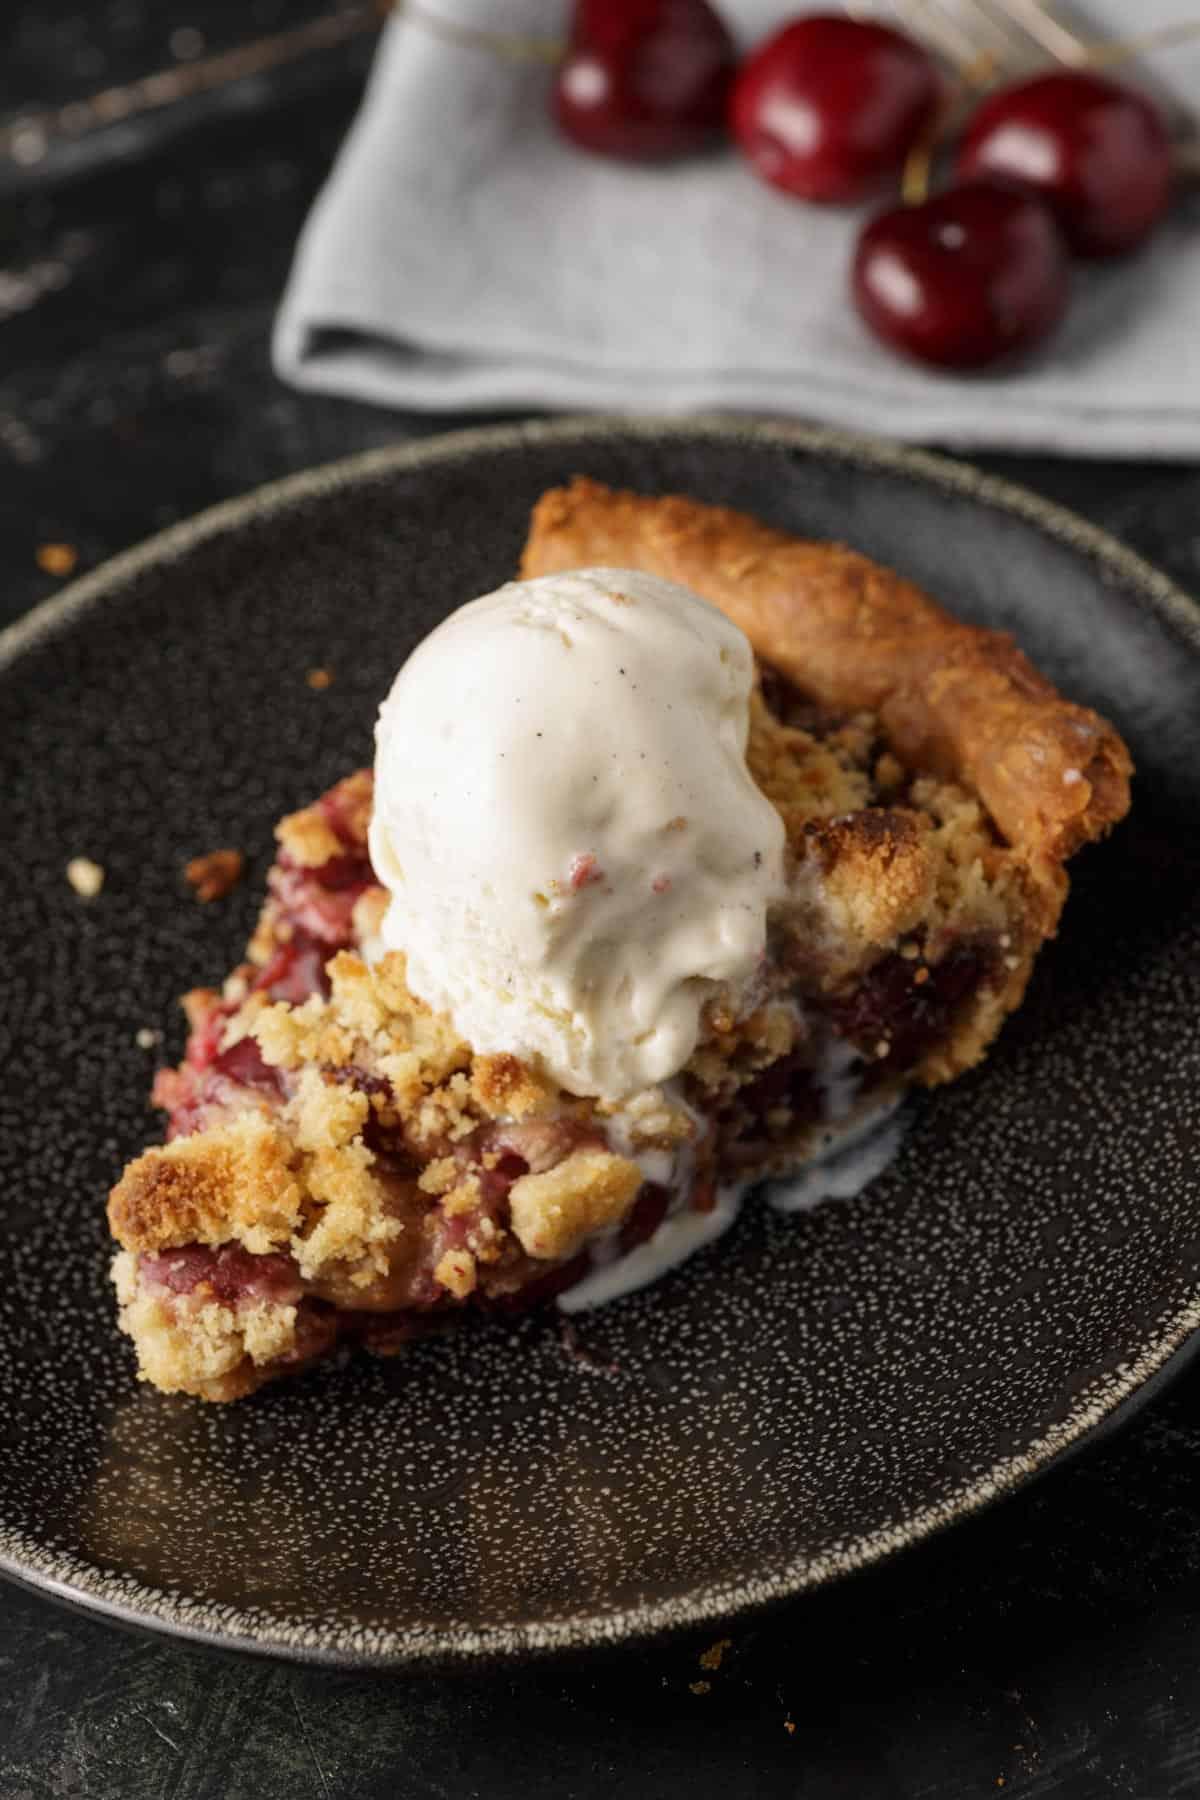 A slice of cherry pie covered in ice cream